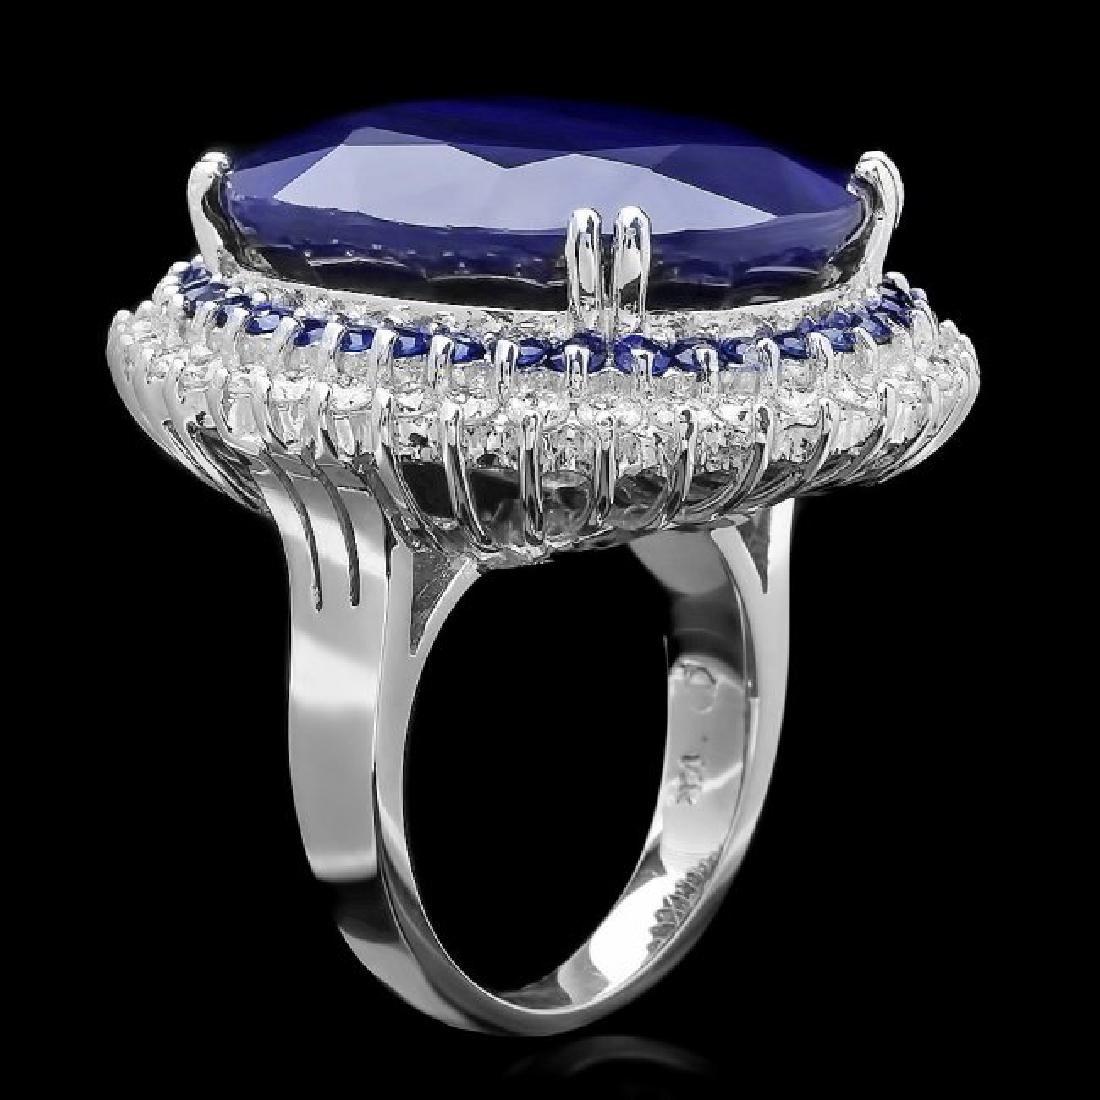 14k Gold 44.4ct Sapphire 1.35ct Diamond Ring - 2